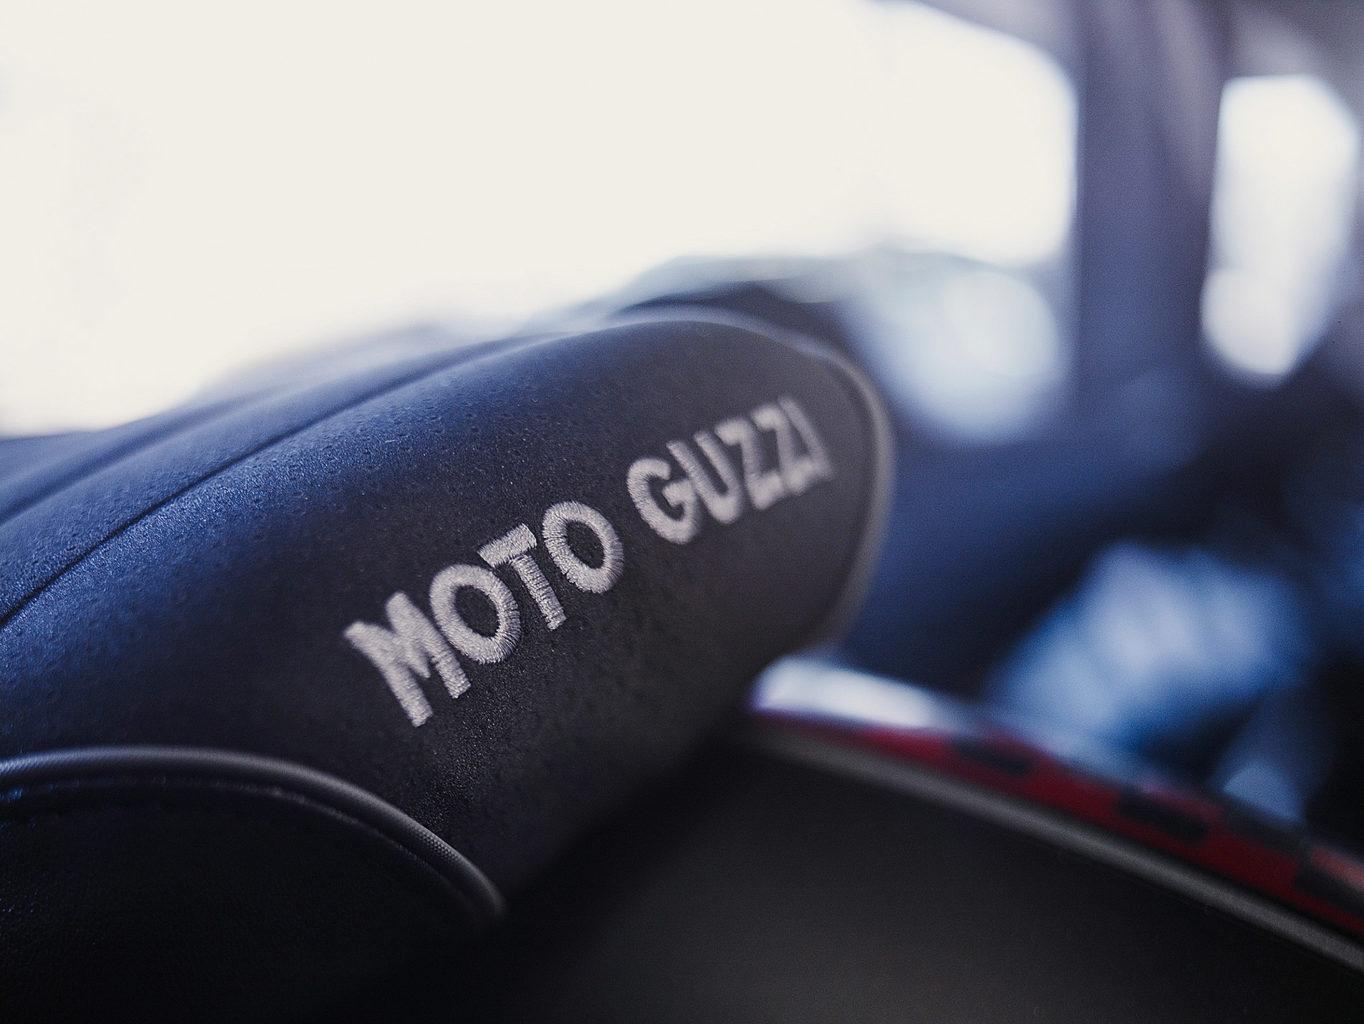 MotoGuzzi_CR_0027_08